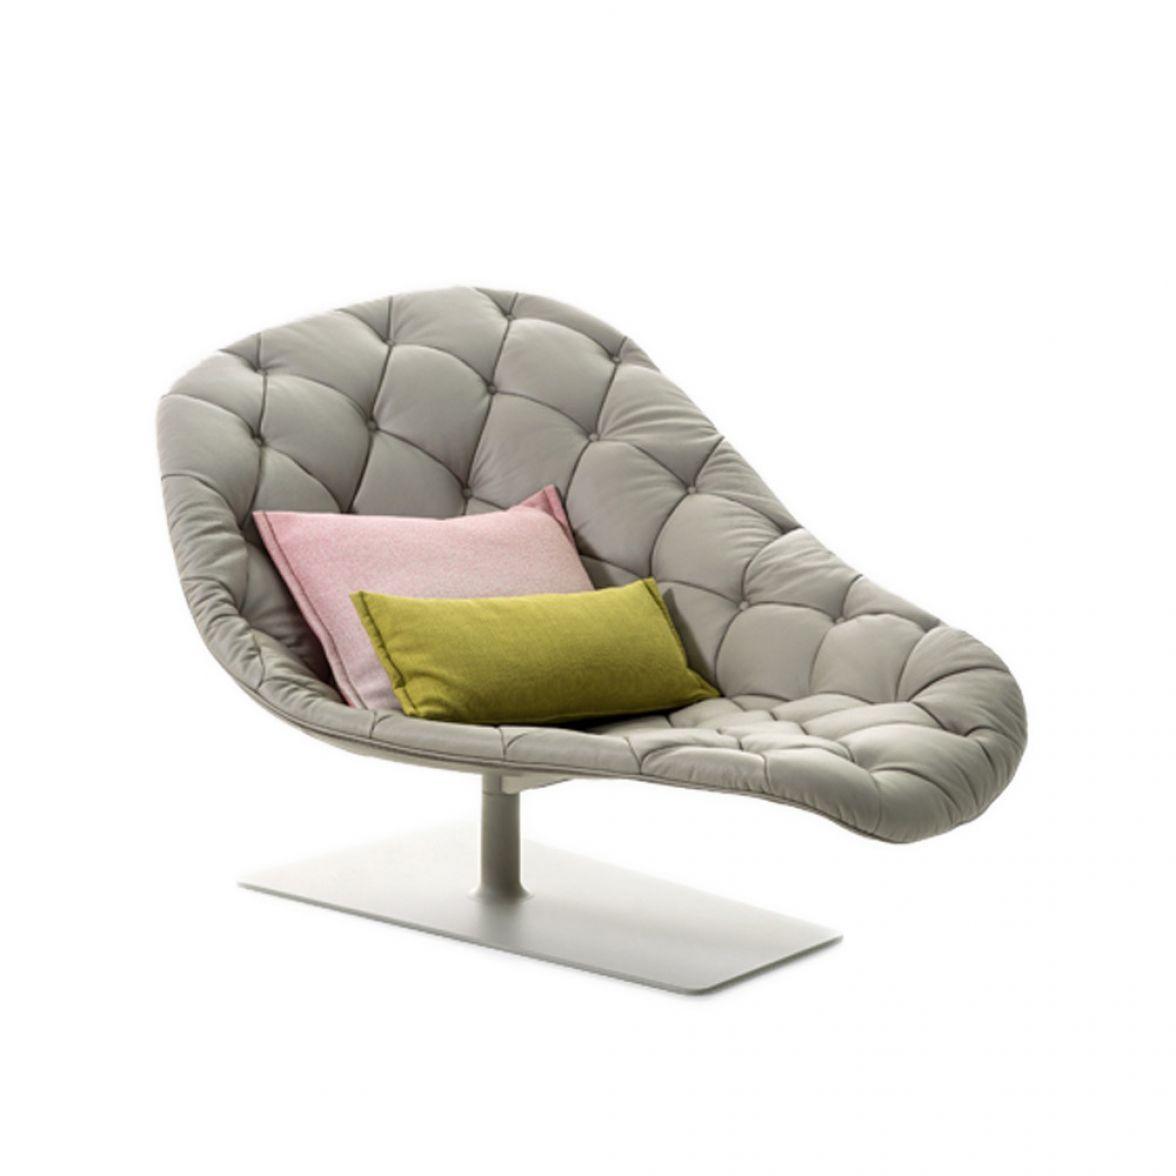 Bohemian chaise longue